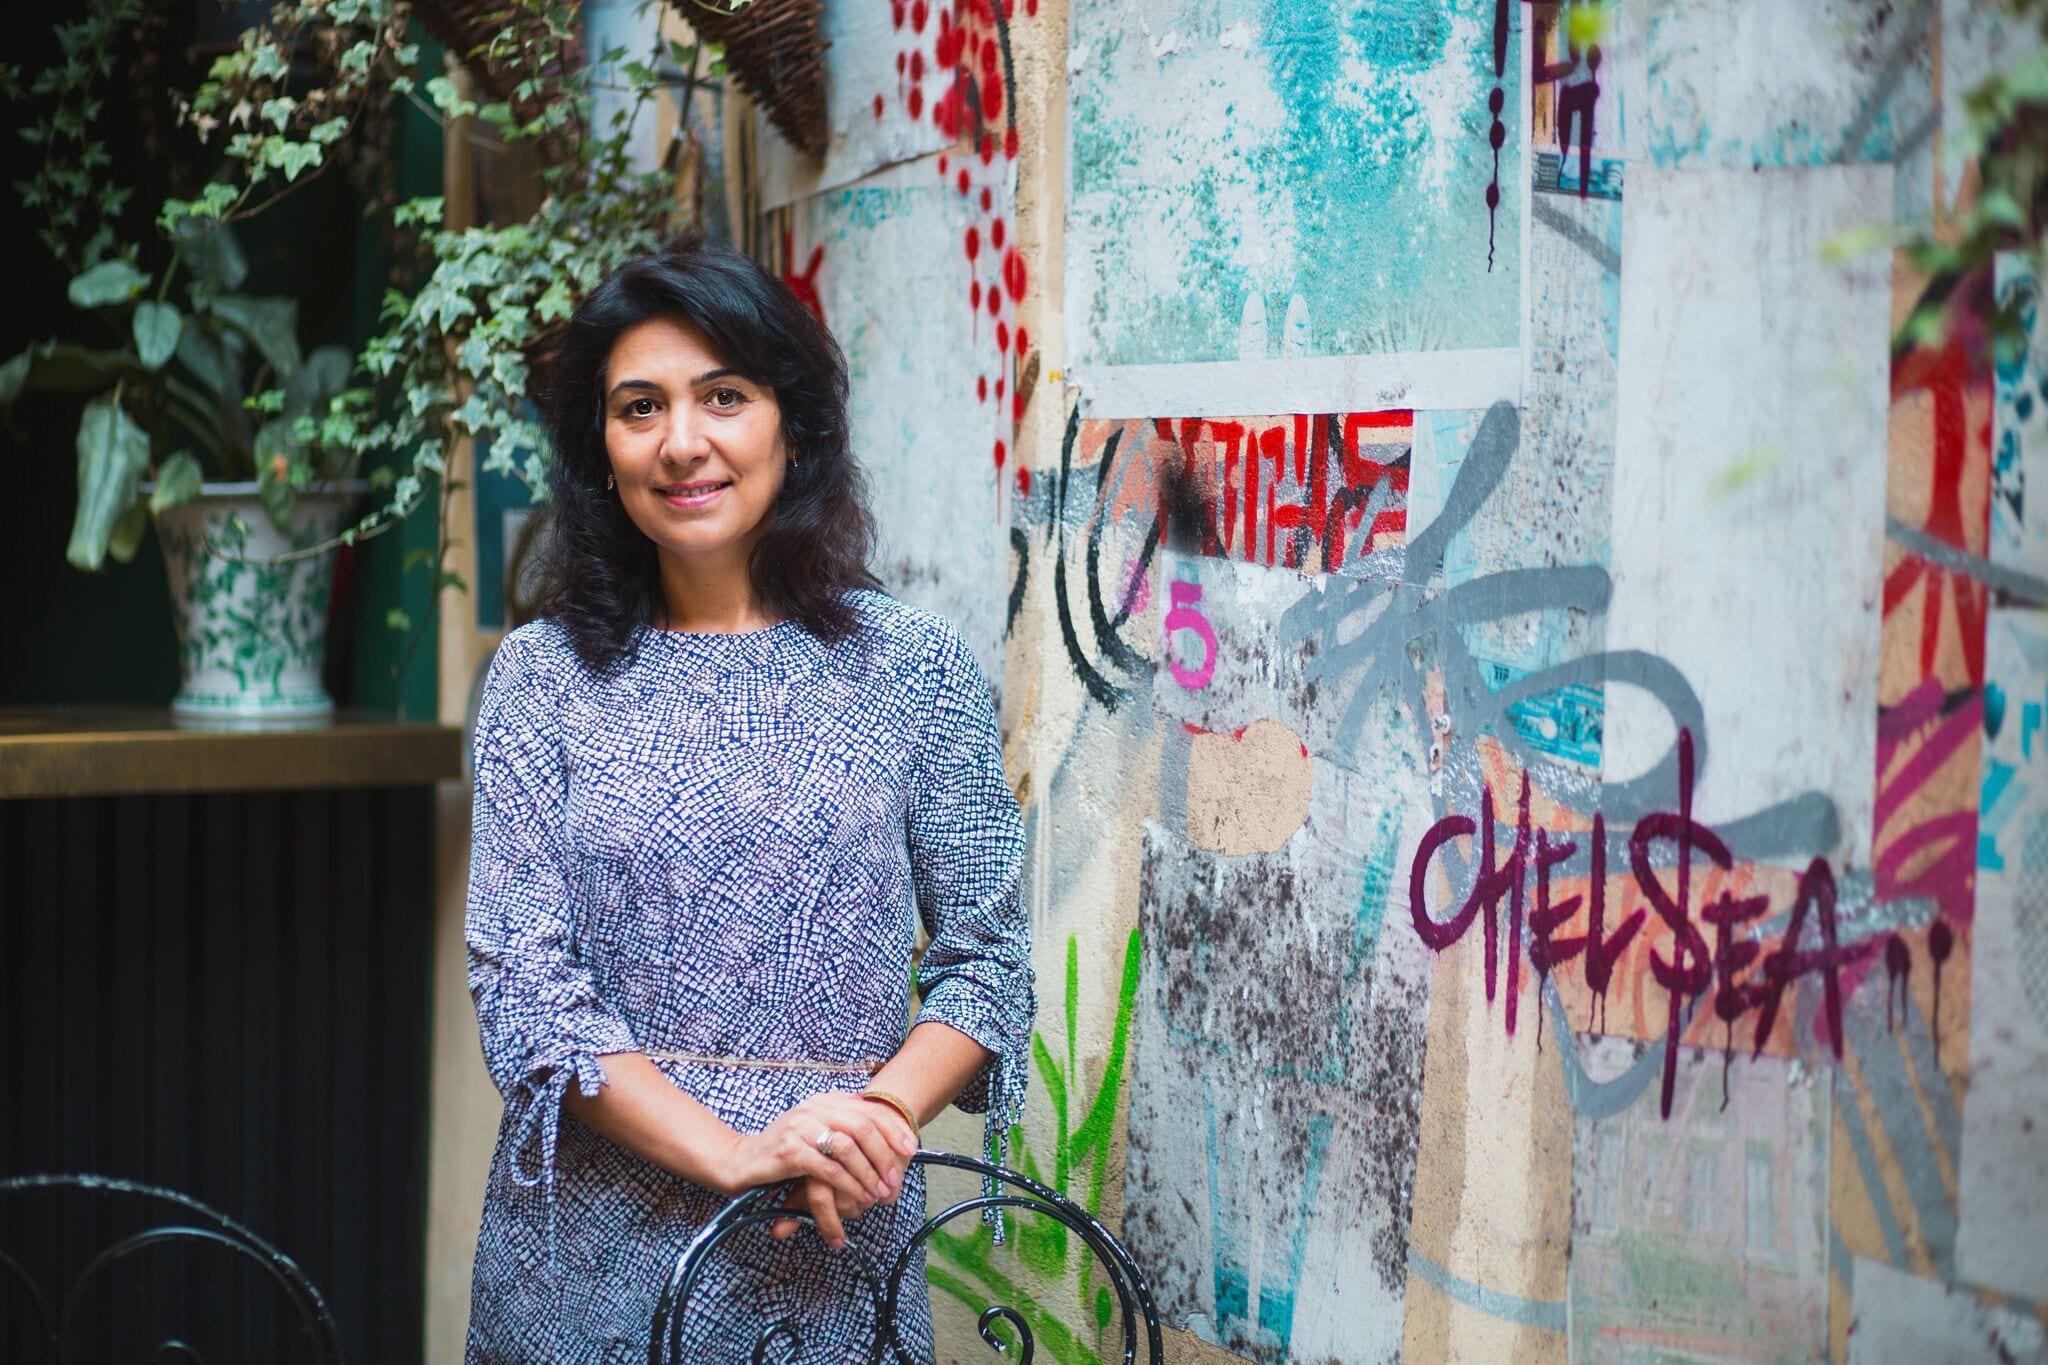 Mat-instagrammaren Maryams guide till Stockholms bästa persiska restauranger